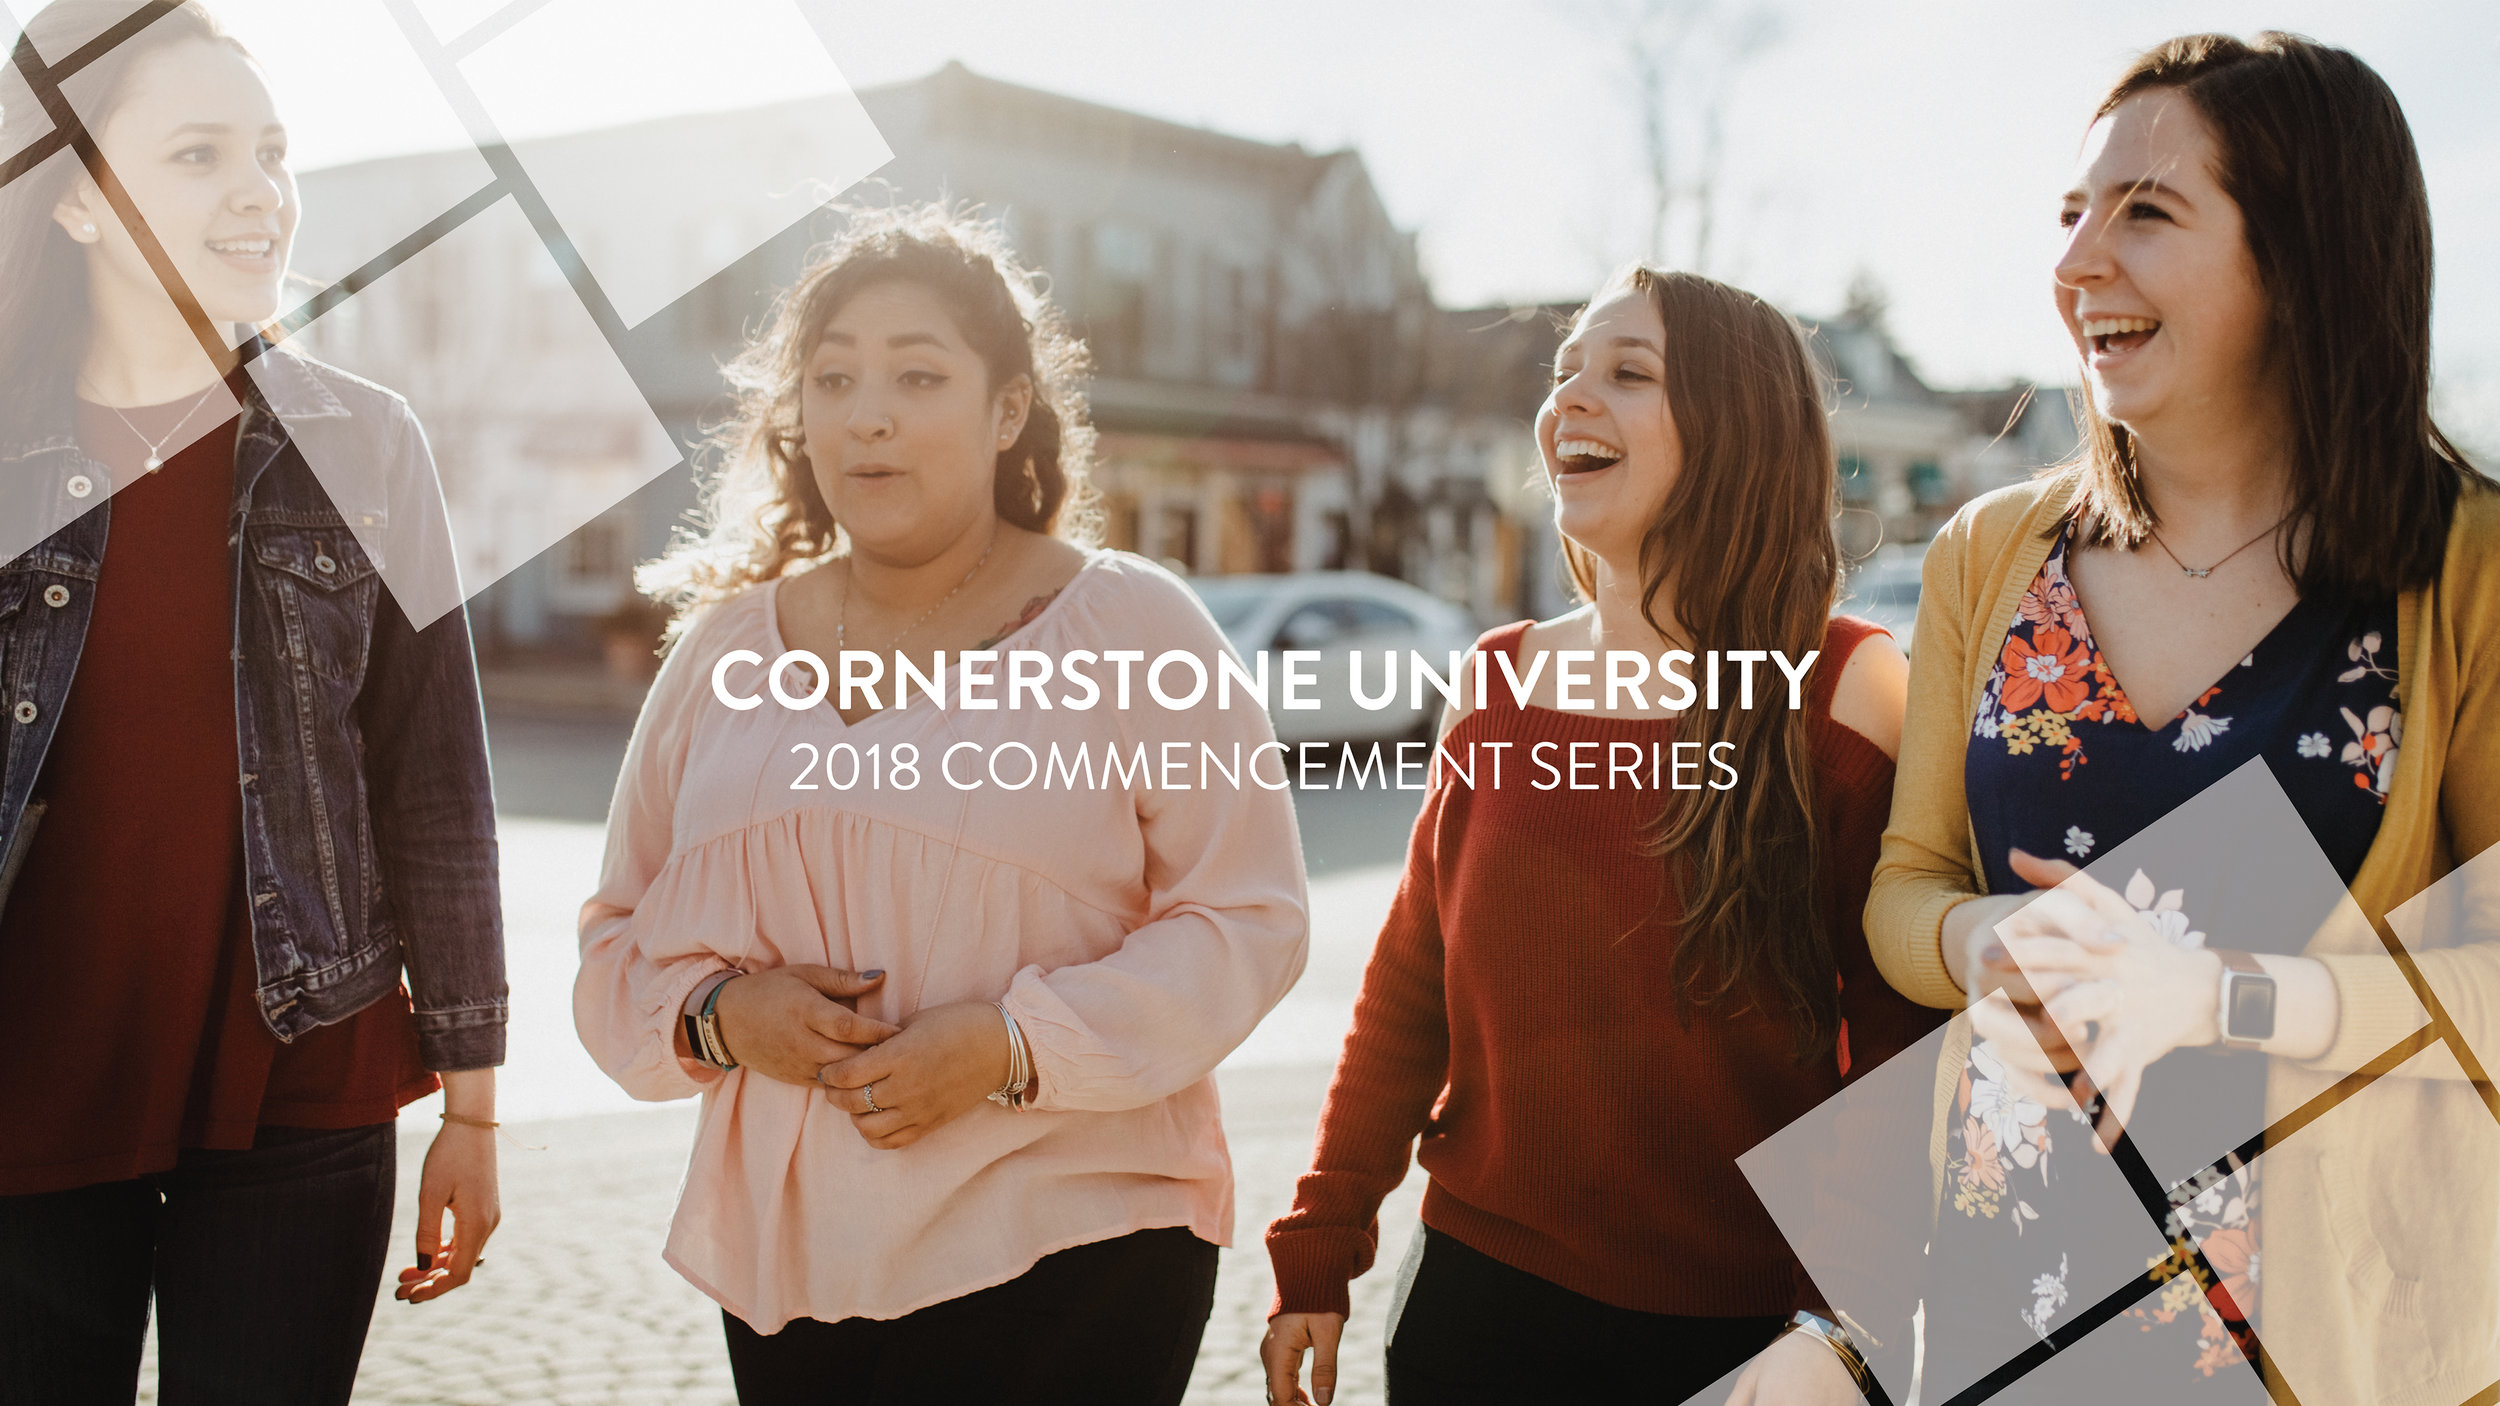 Cornerstone-University-Corporate-Video-Commencement-Series.jpg